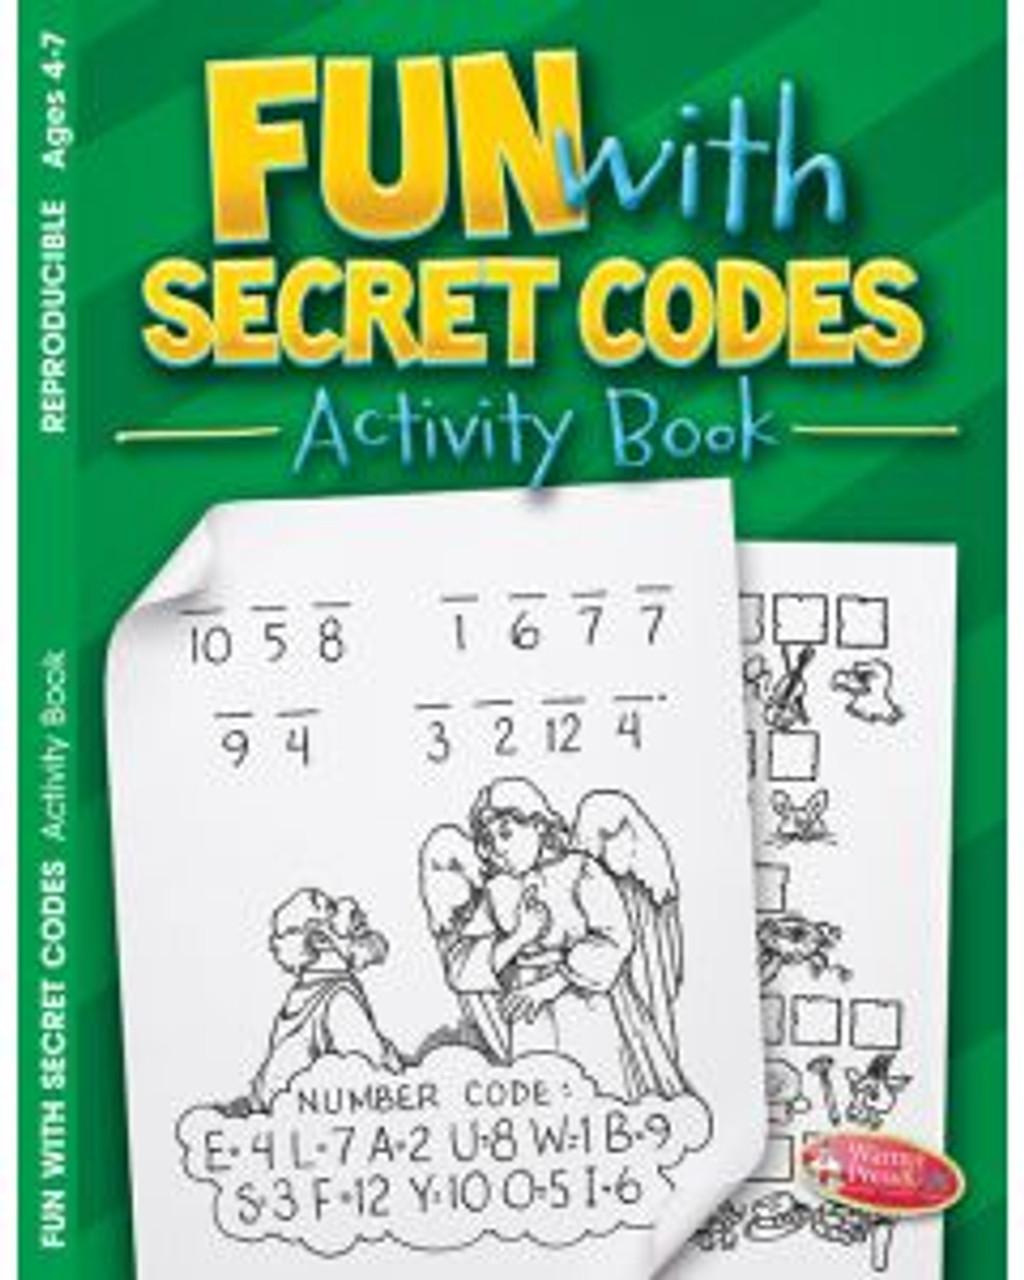 Fun With Secret Codes (activity book)